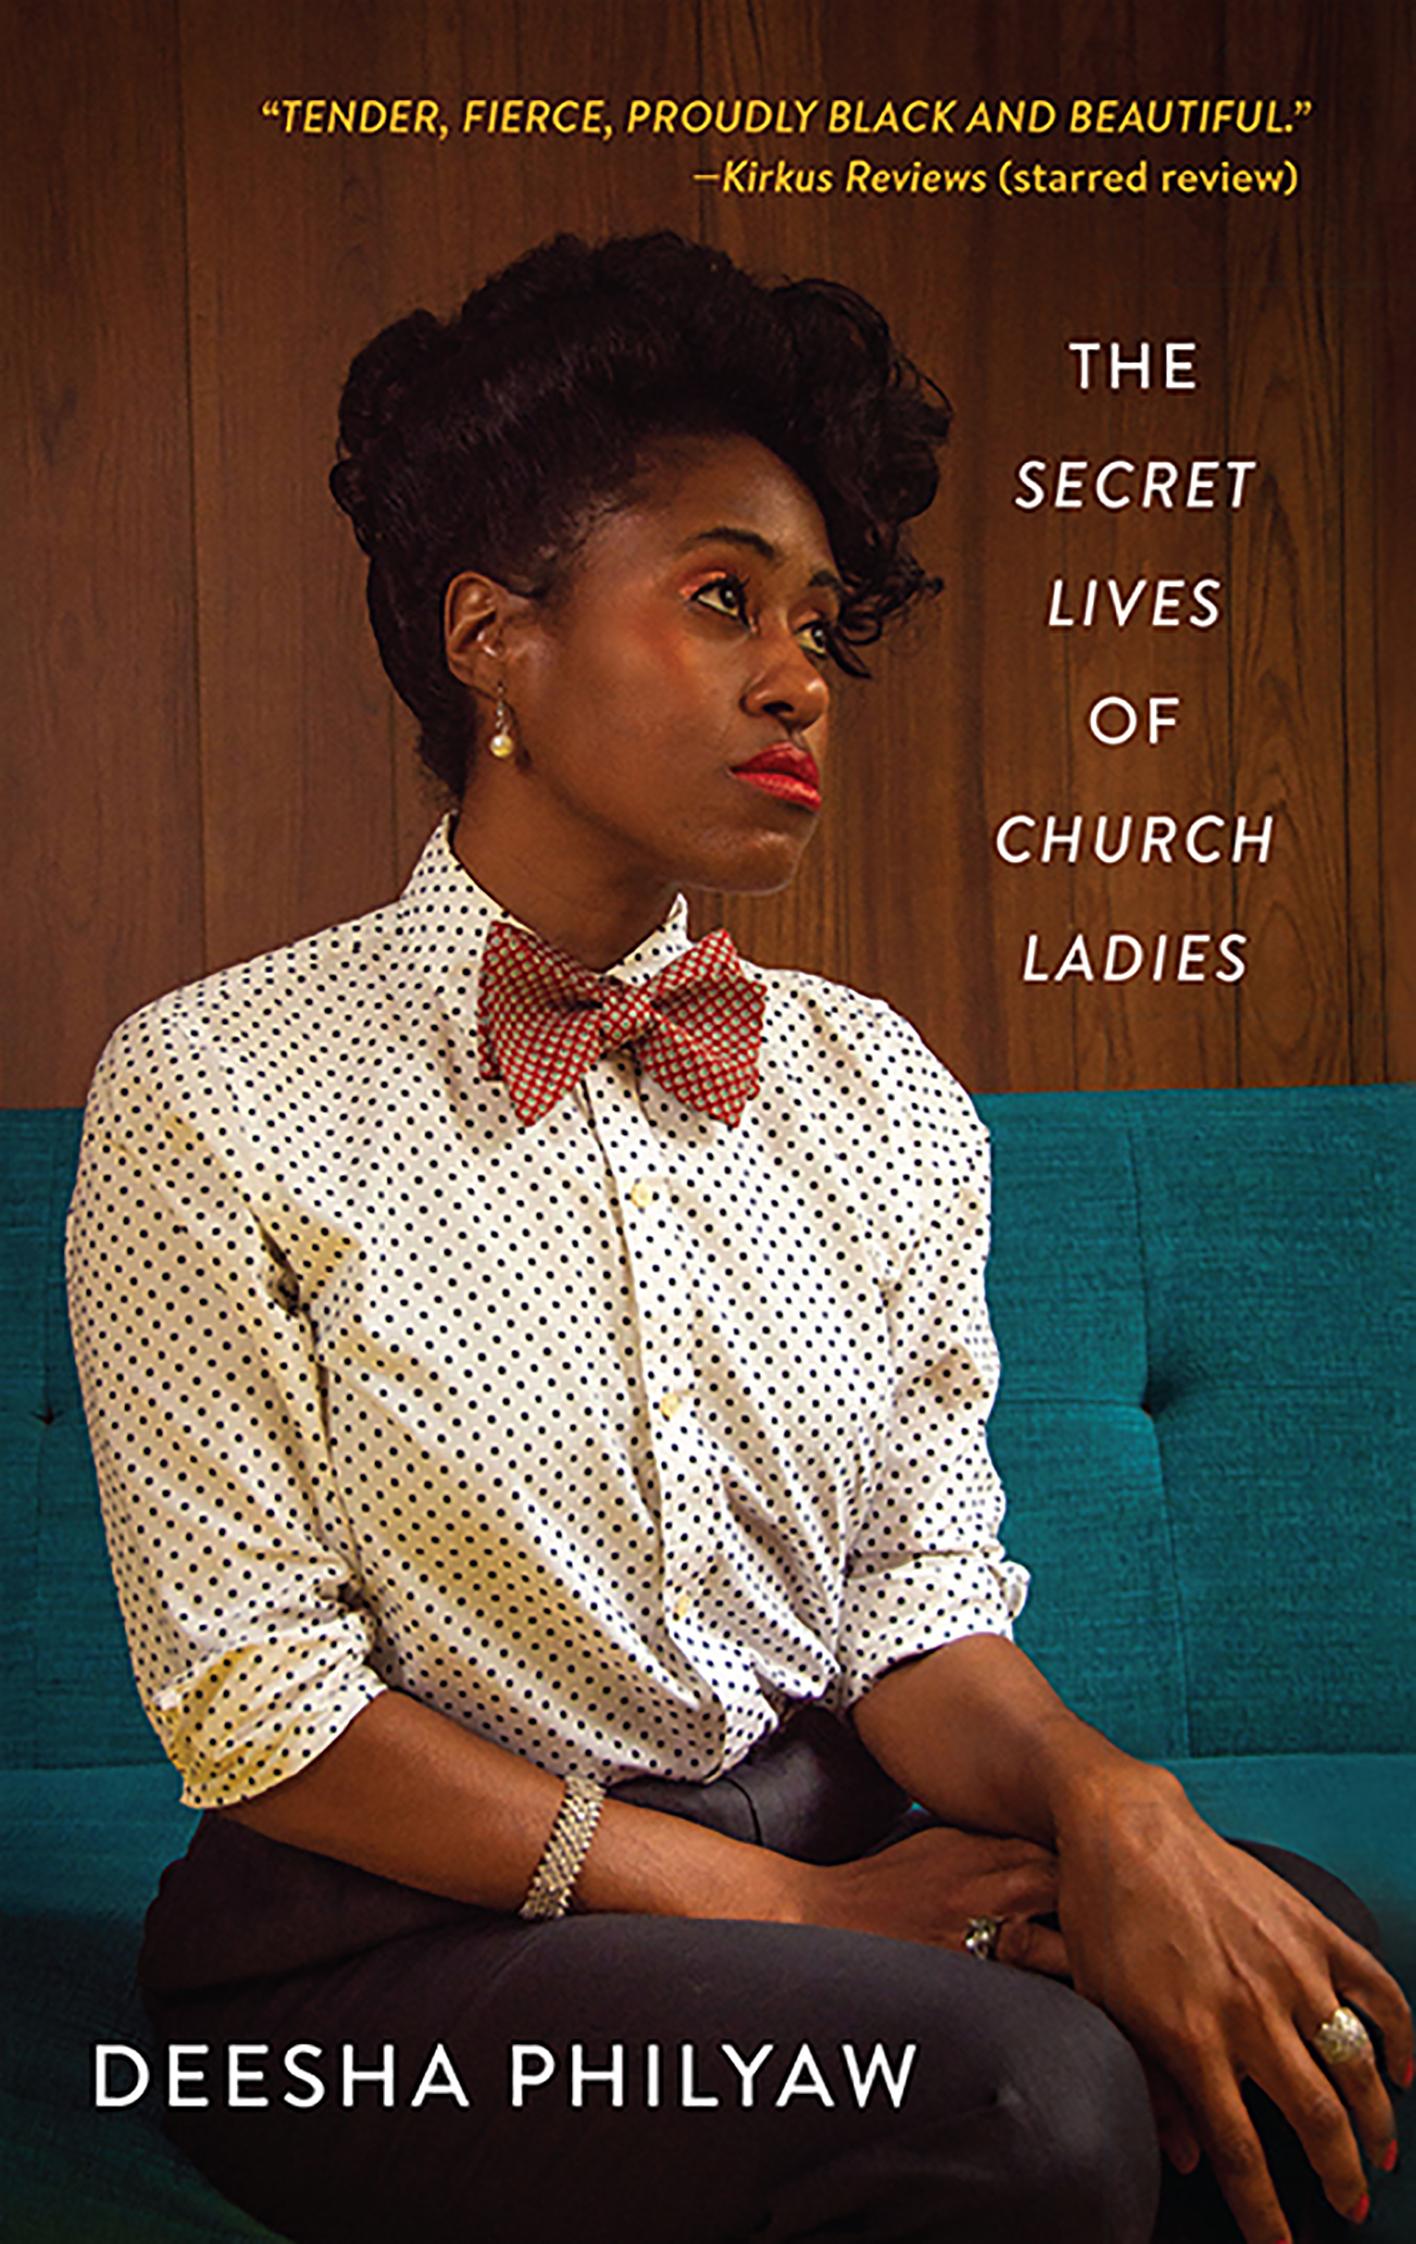 The Secret Lives of Church Ladies by Deesha Philyaw